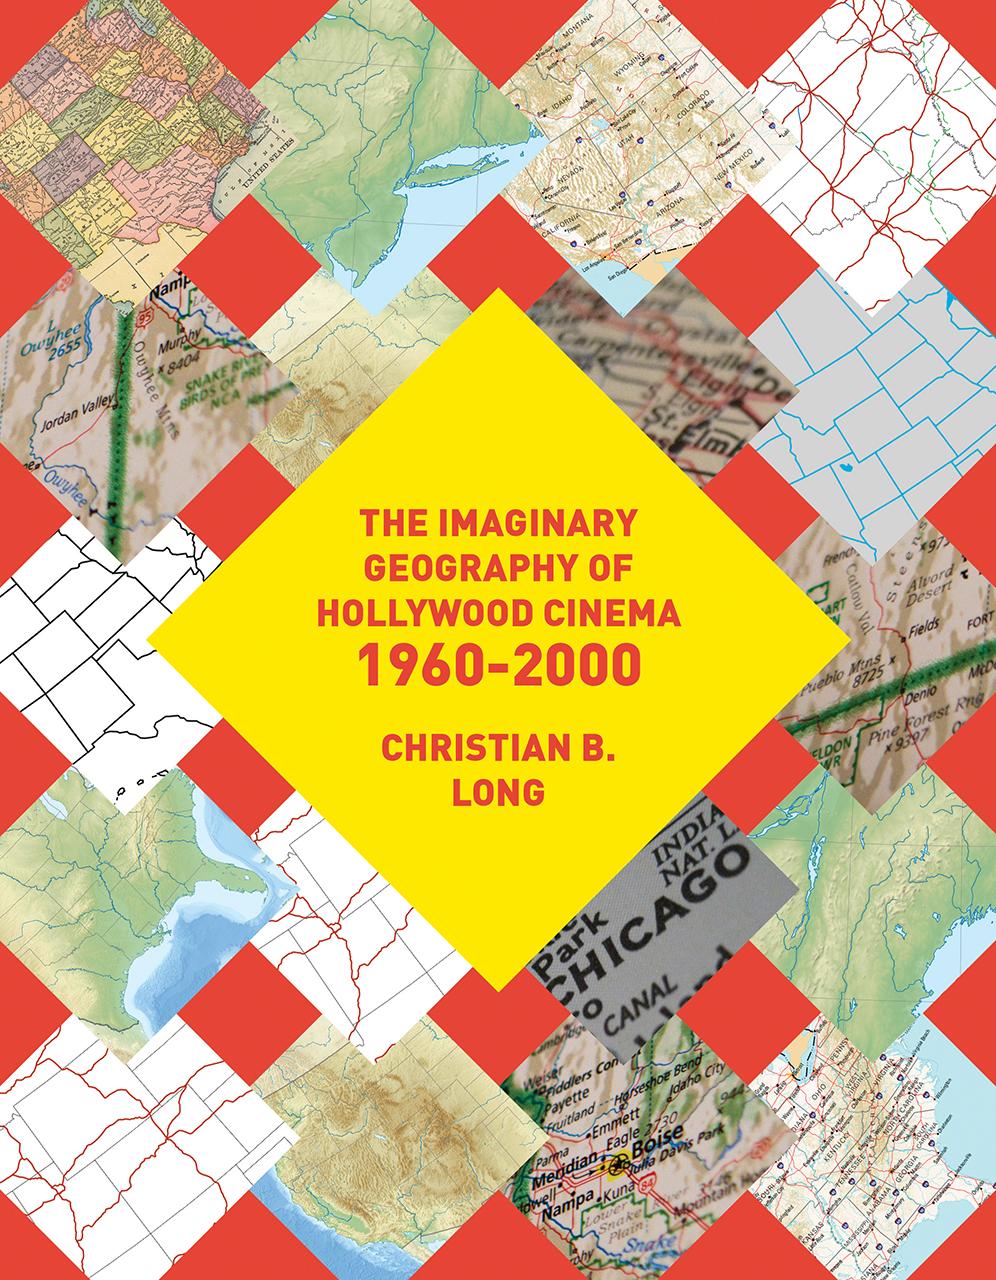 Imaginary Geography of Hollywood Cinema 1960-2000